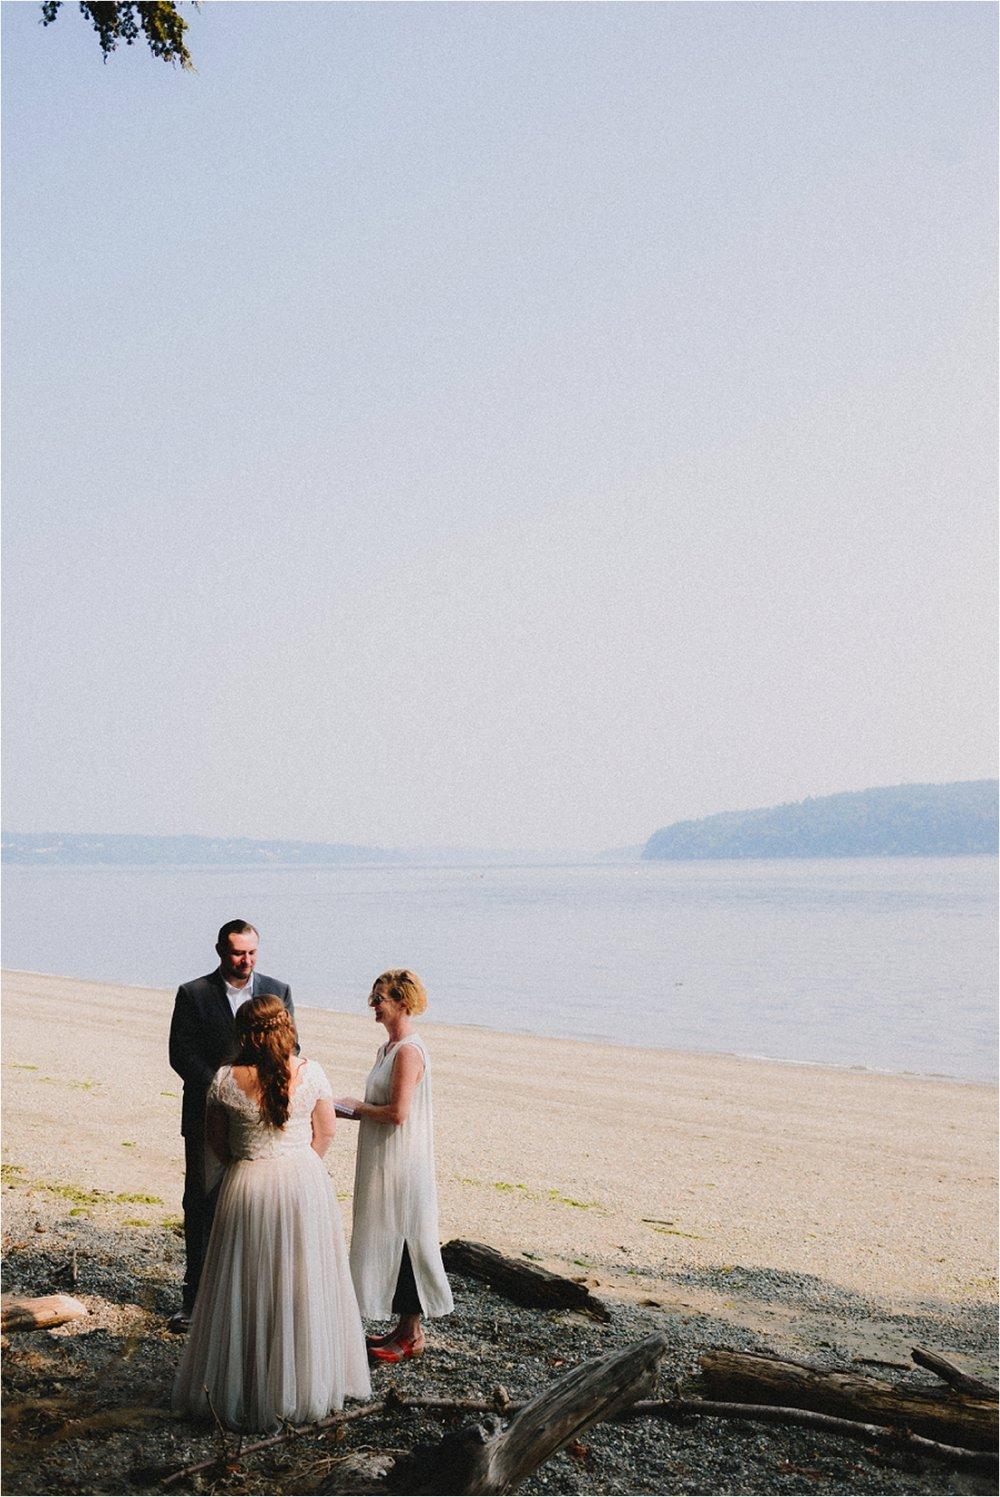 owen-beach-priest-point-park-tacoma-washington-elopement-jannicka-mayte-anchorage-alaska-wedding-elopement-photographer (40).jpg